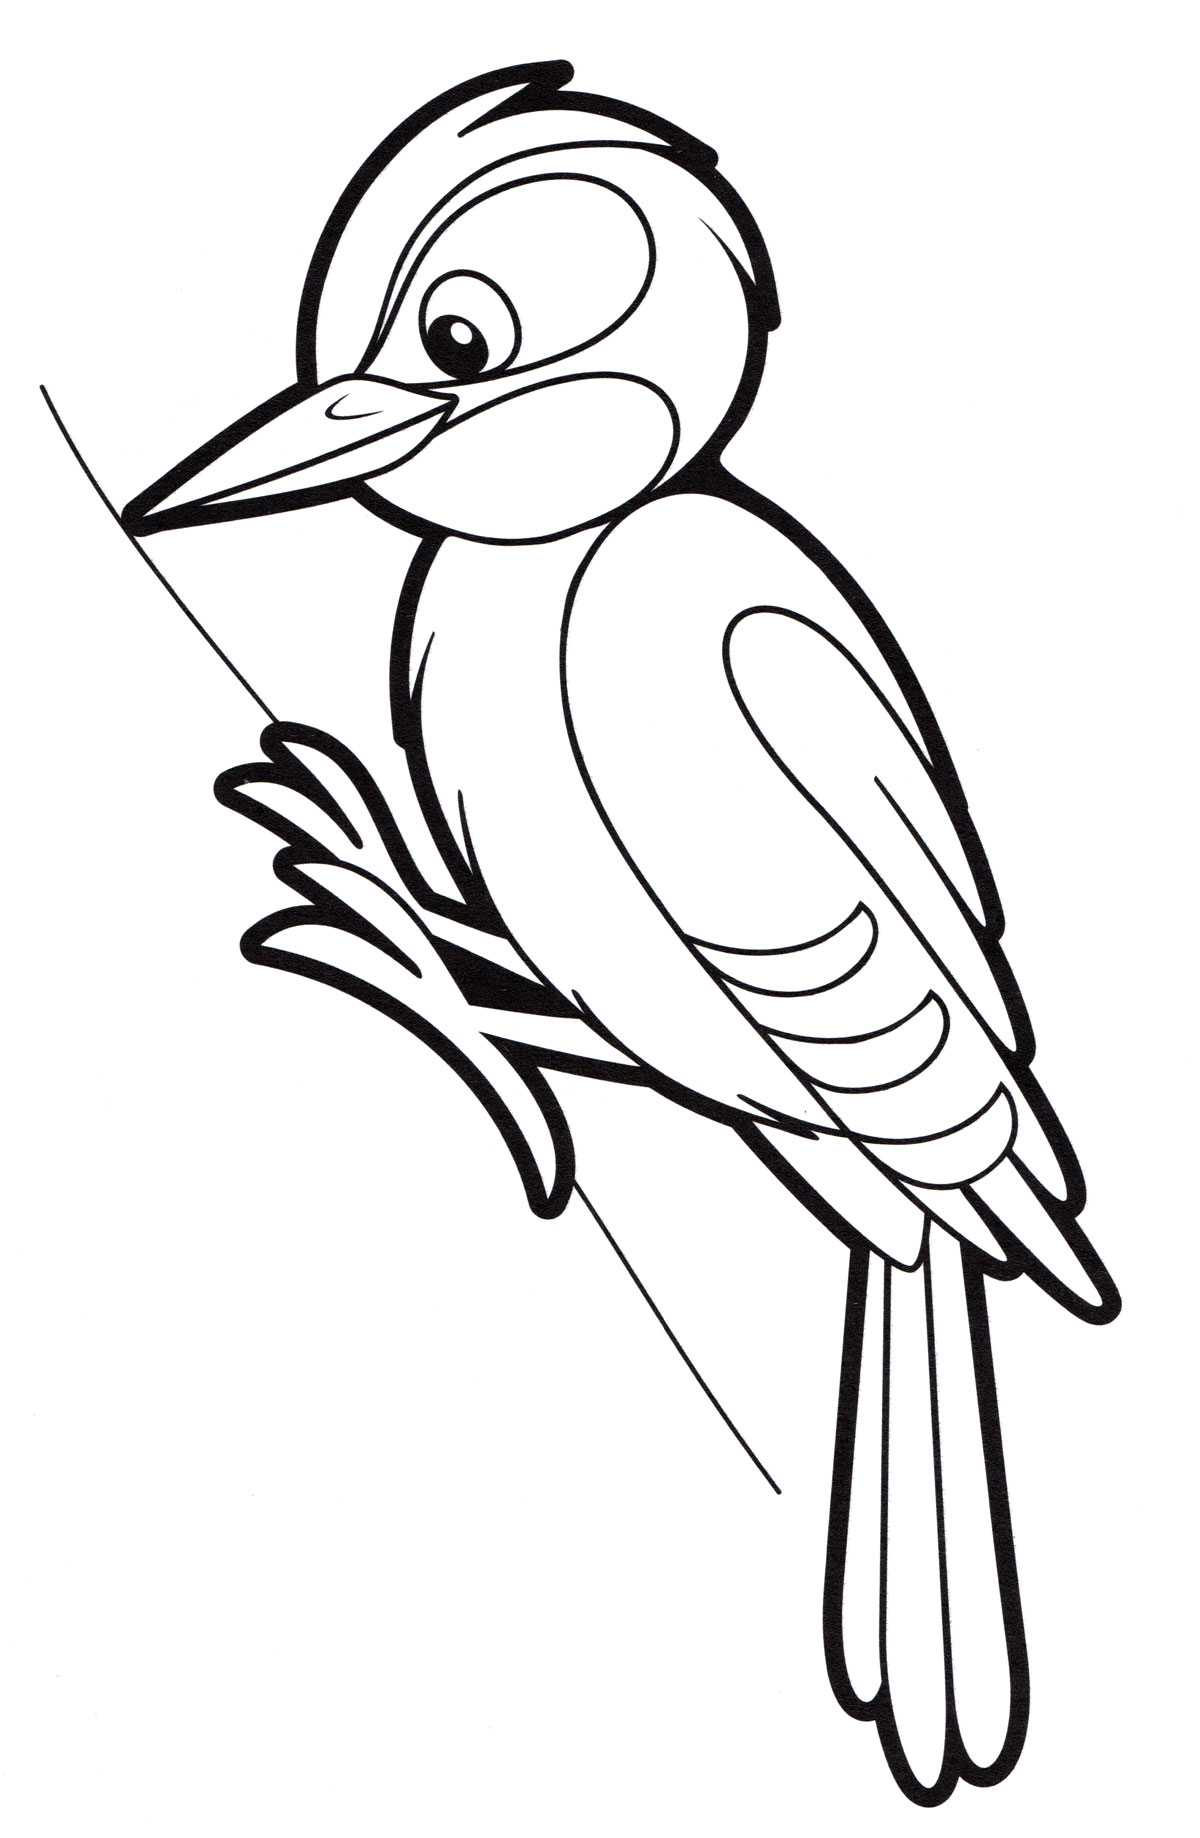 Дятел птица рисунок